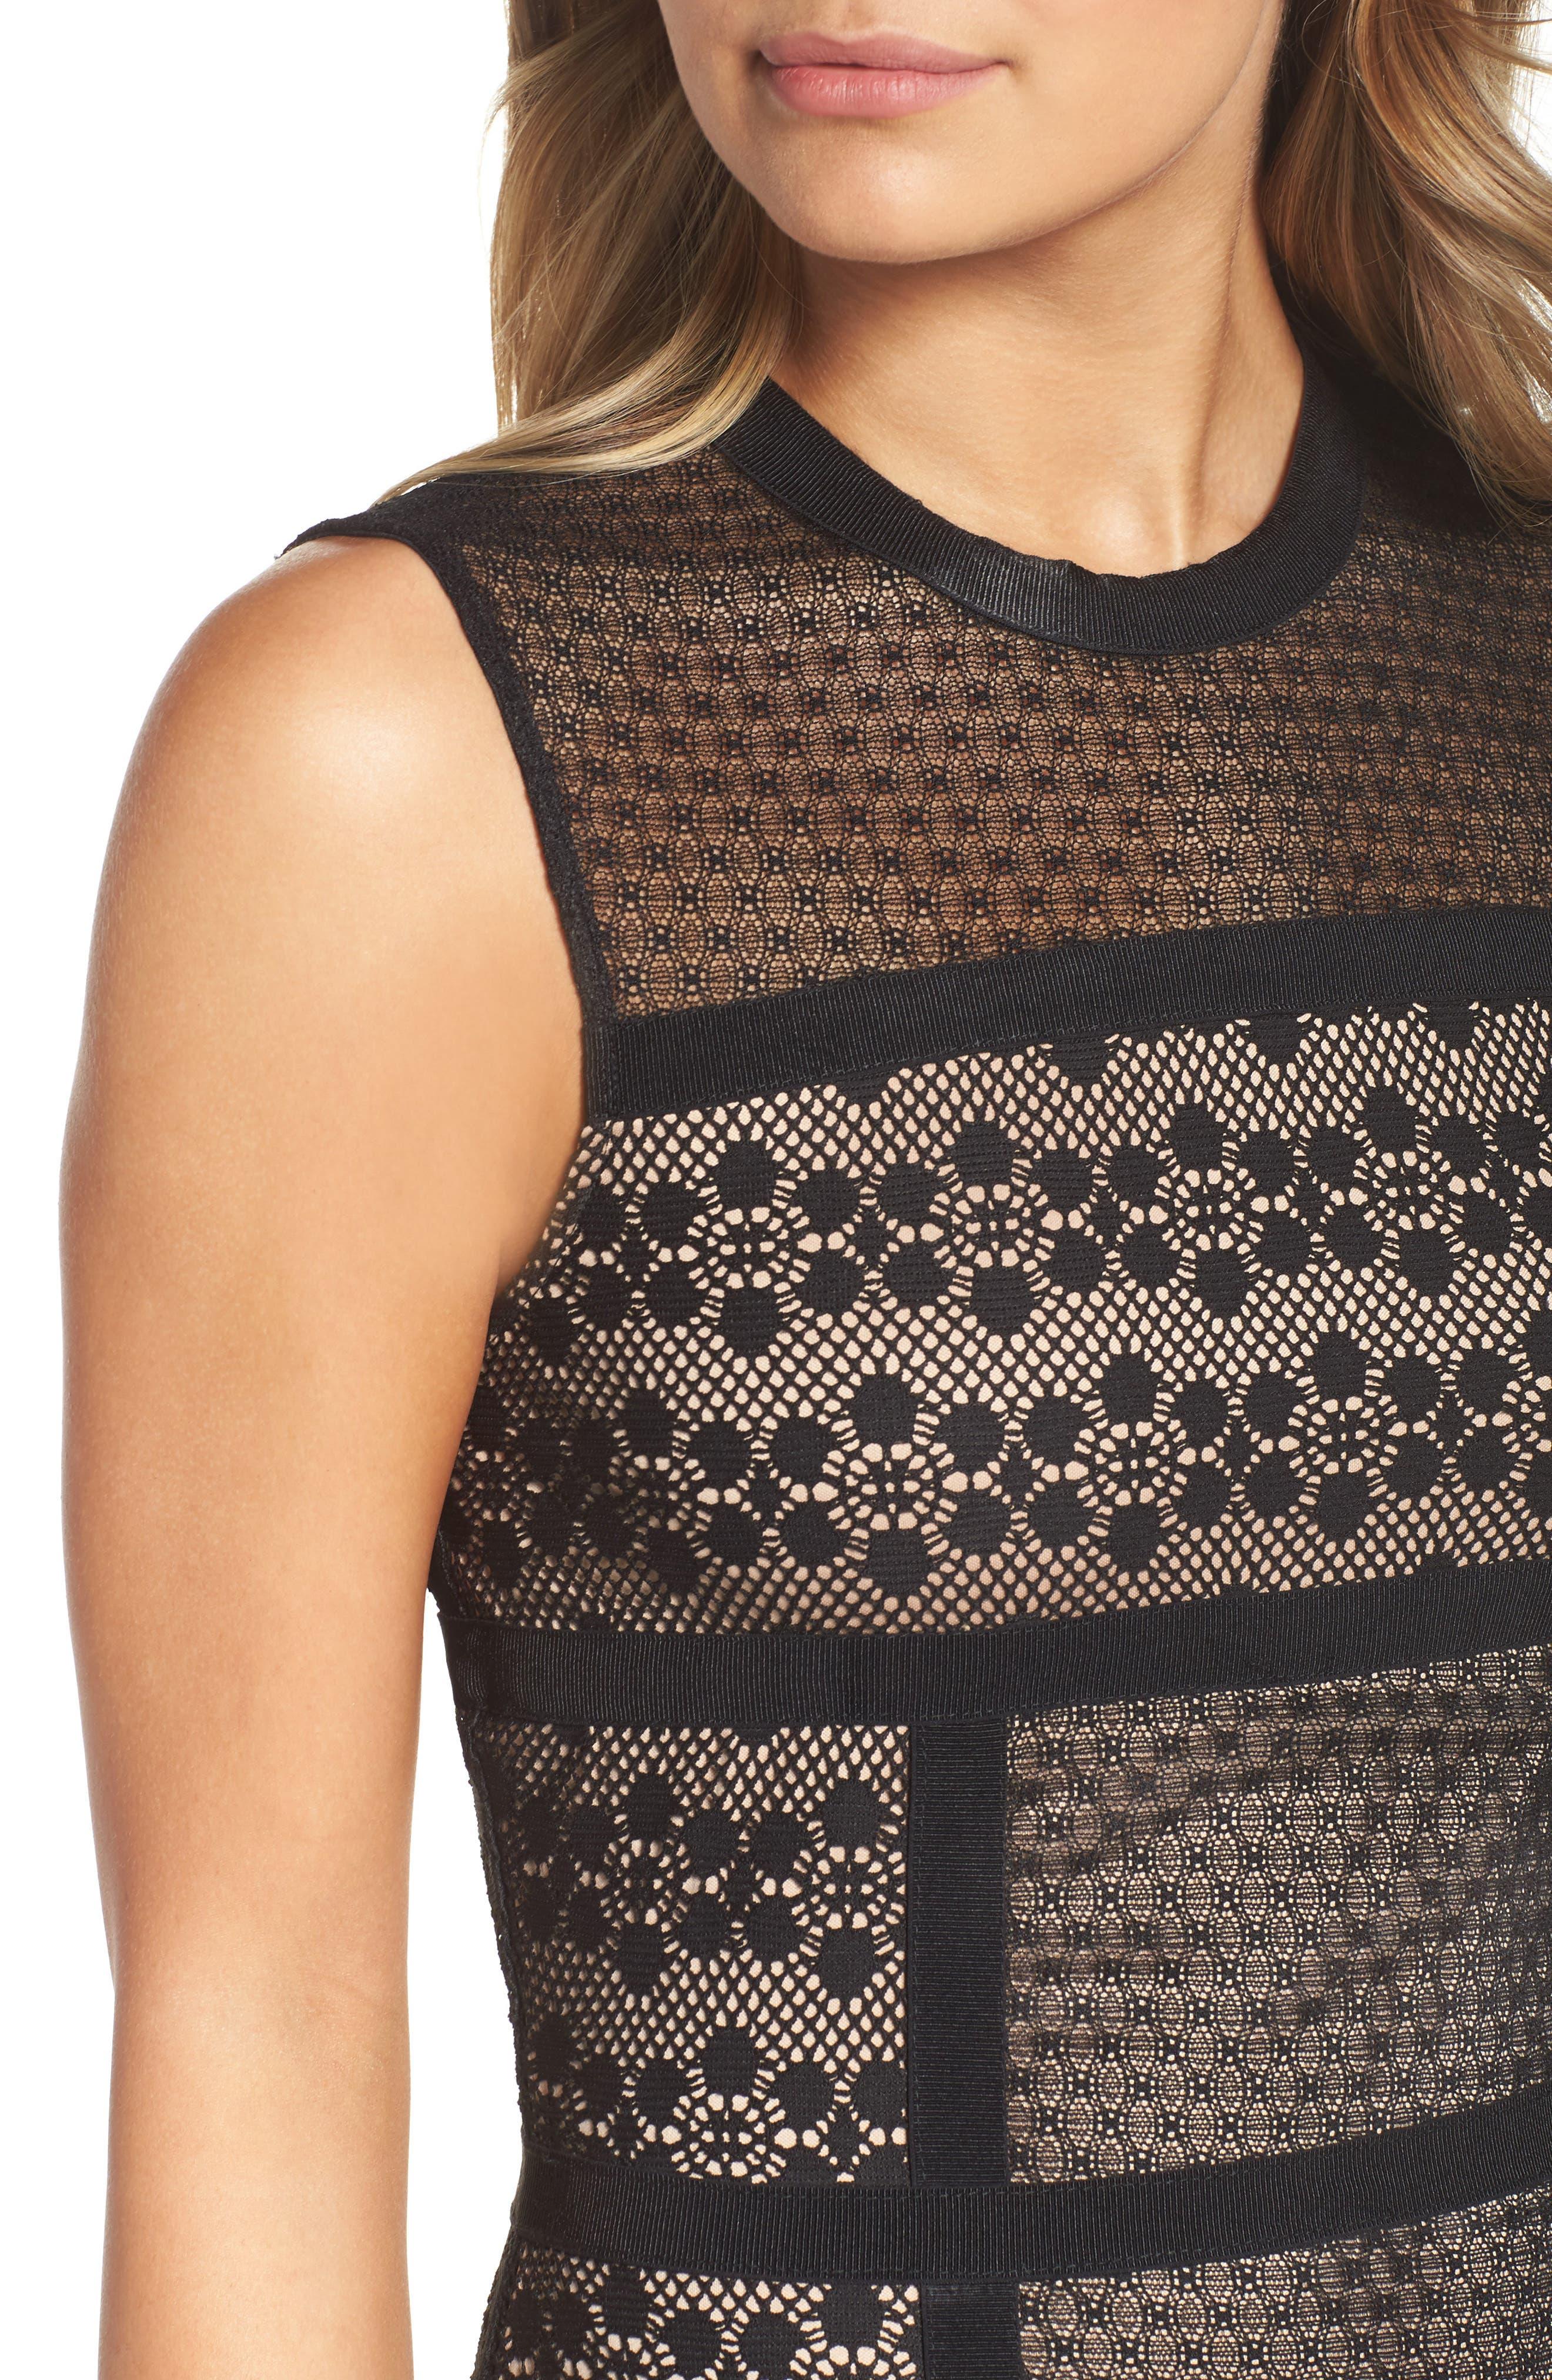 Hola Mamacita Body-Con Dress,                             Alternate thumbnail 4, color,                             001